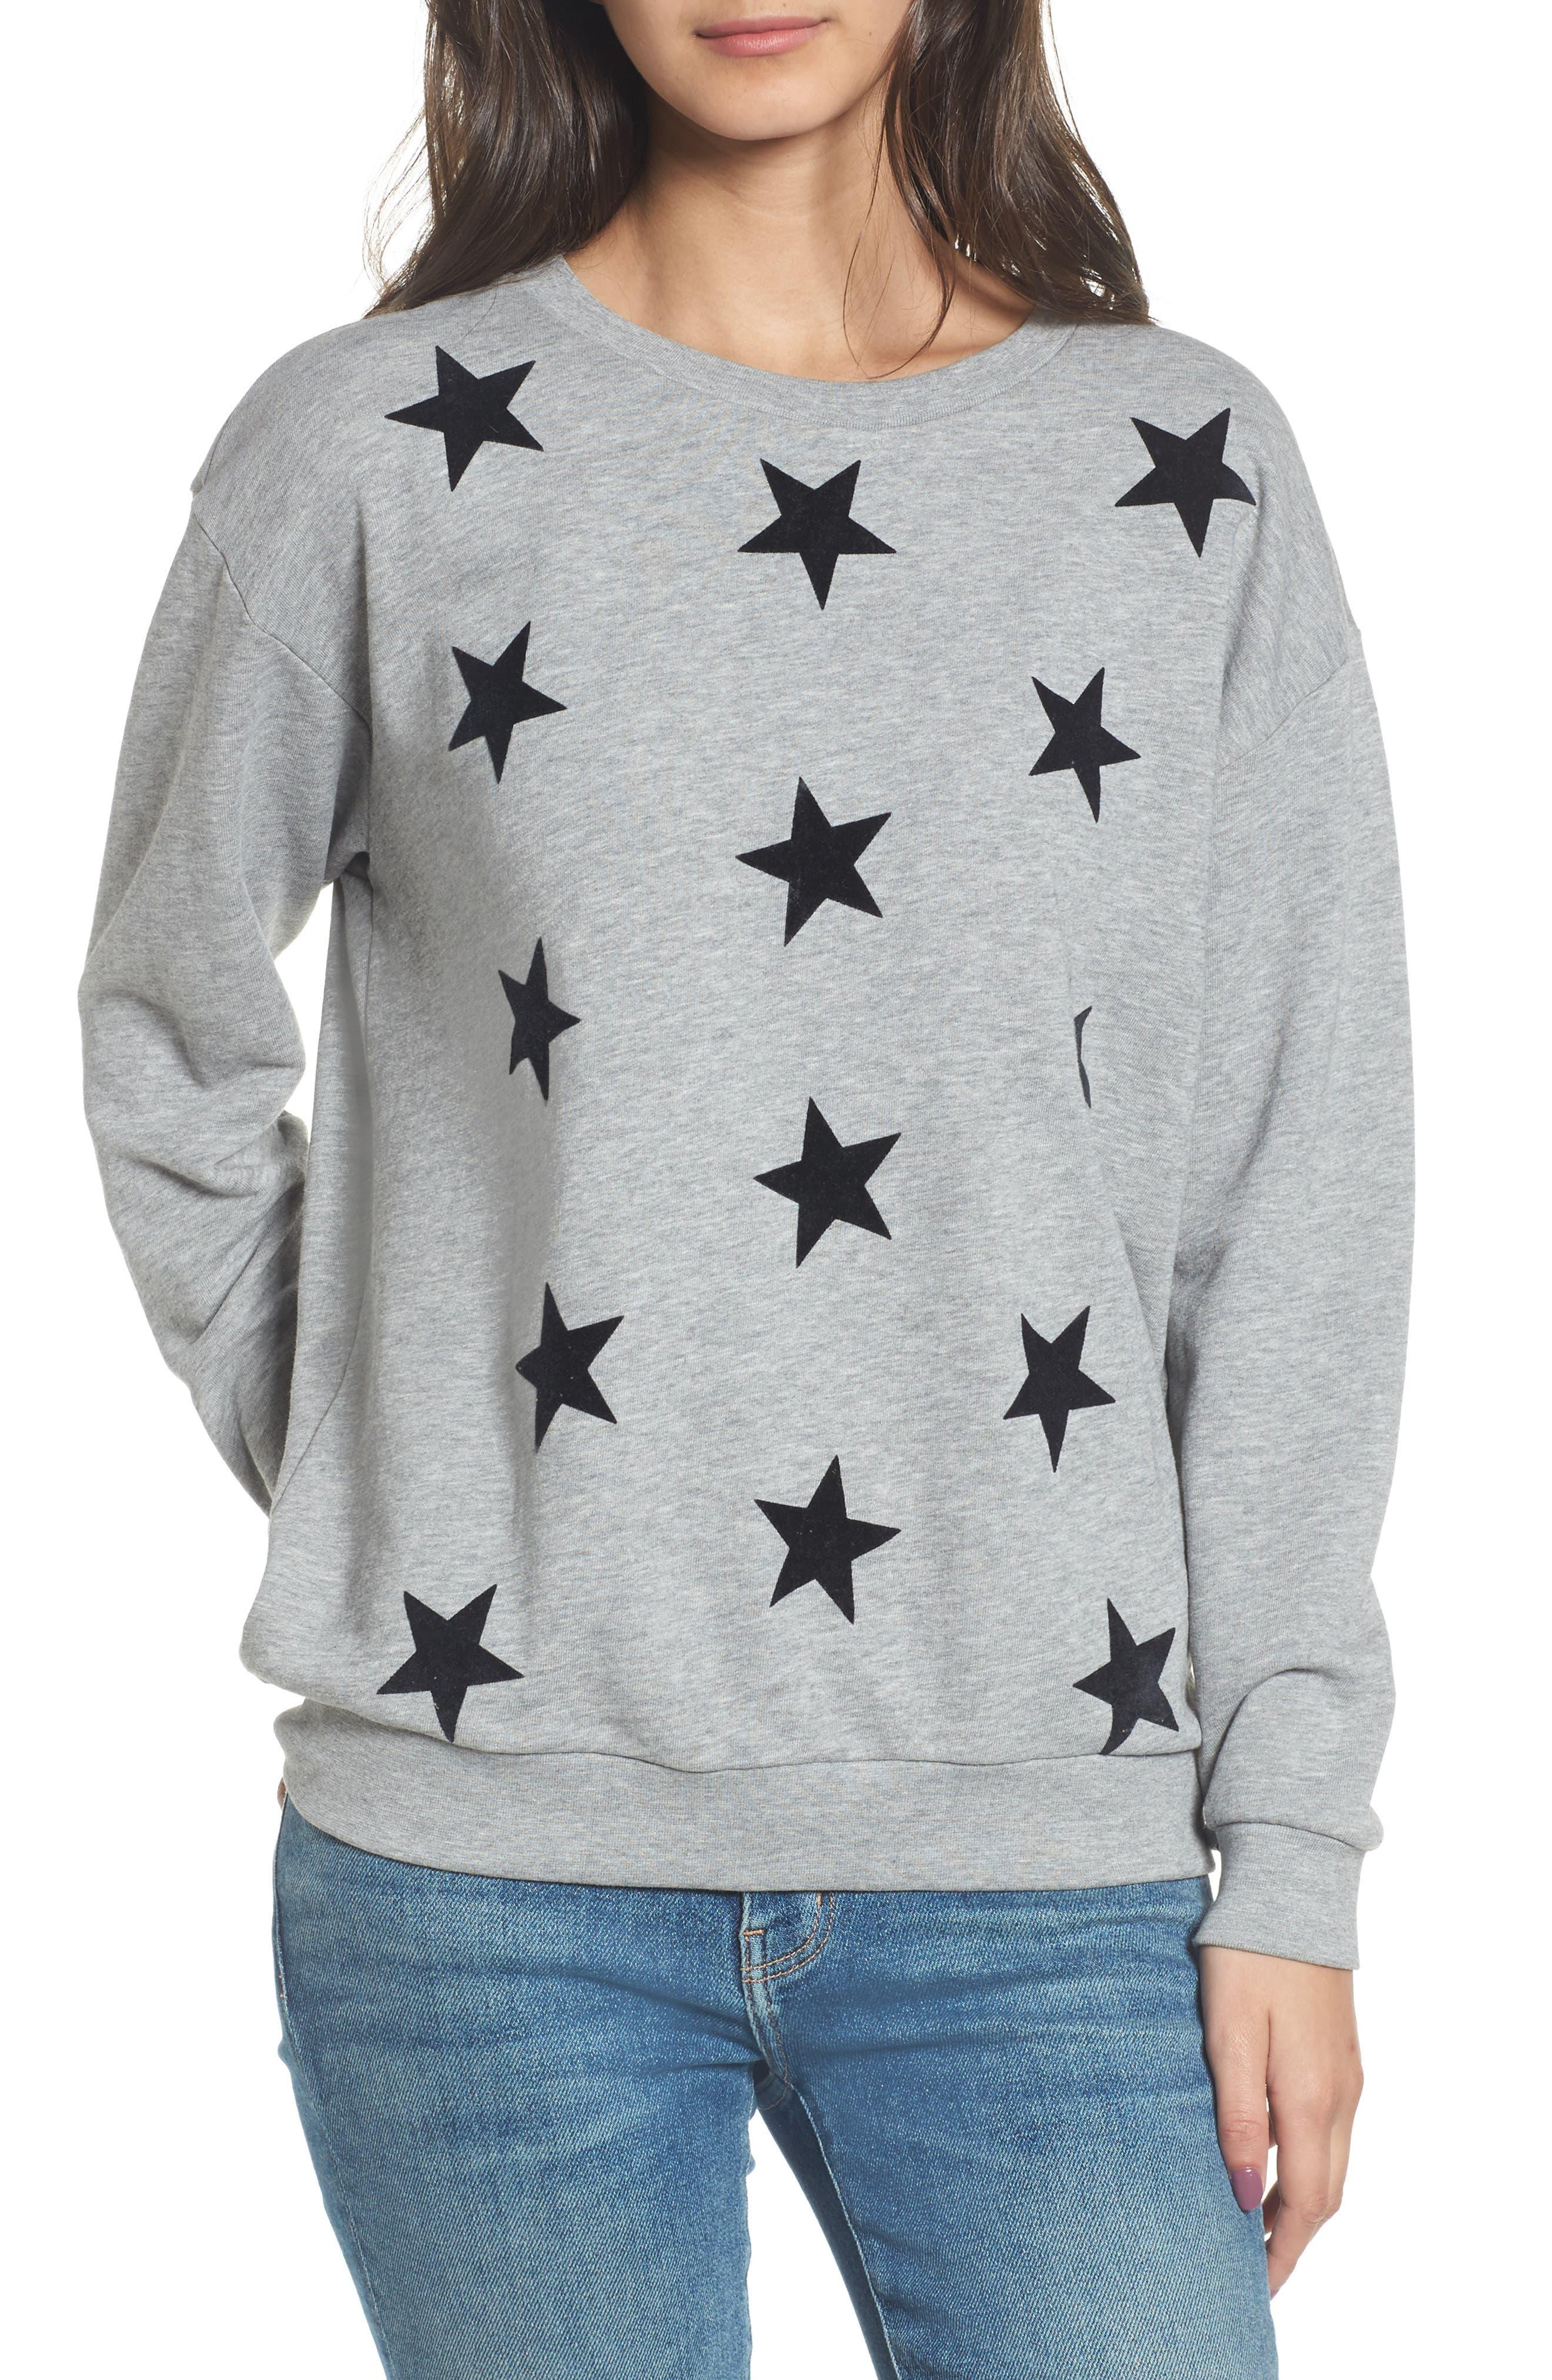 Alexa - Super Stars Sweatshirt,                         Main,                         color, 020